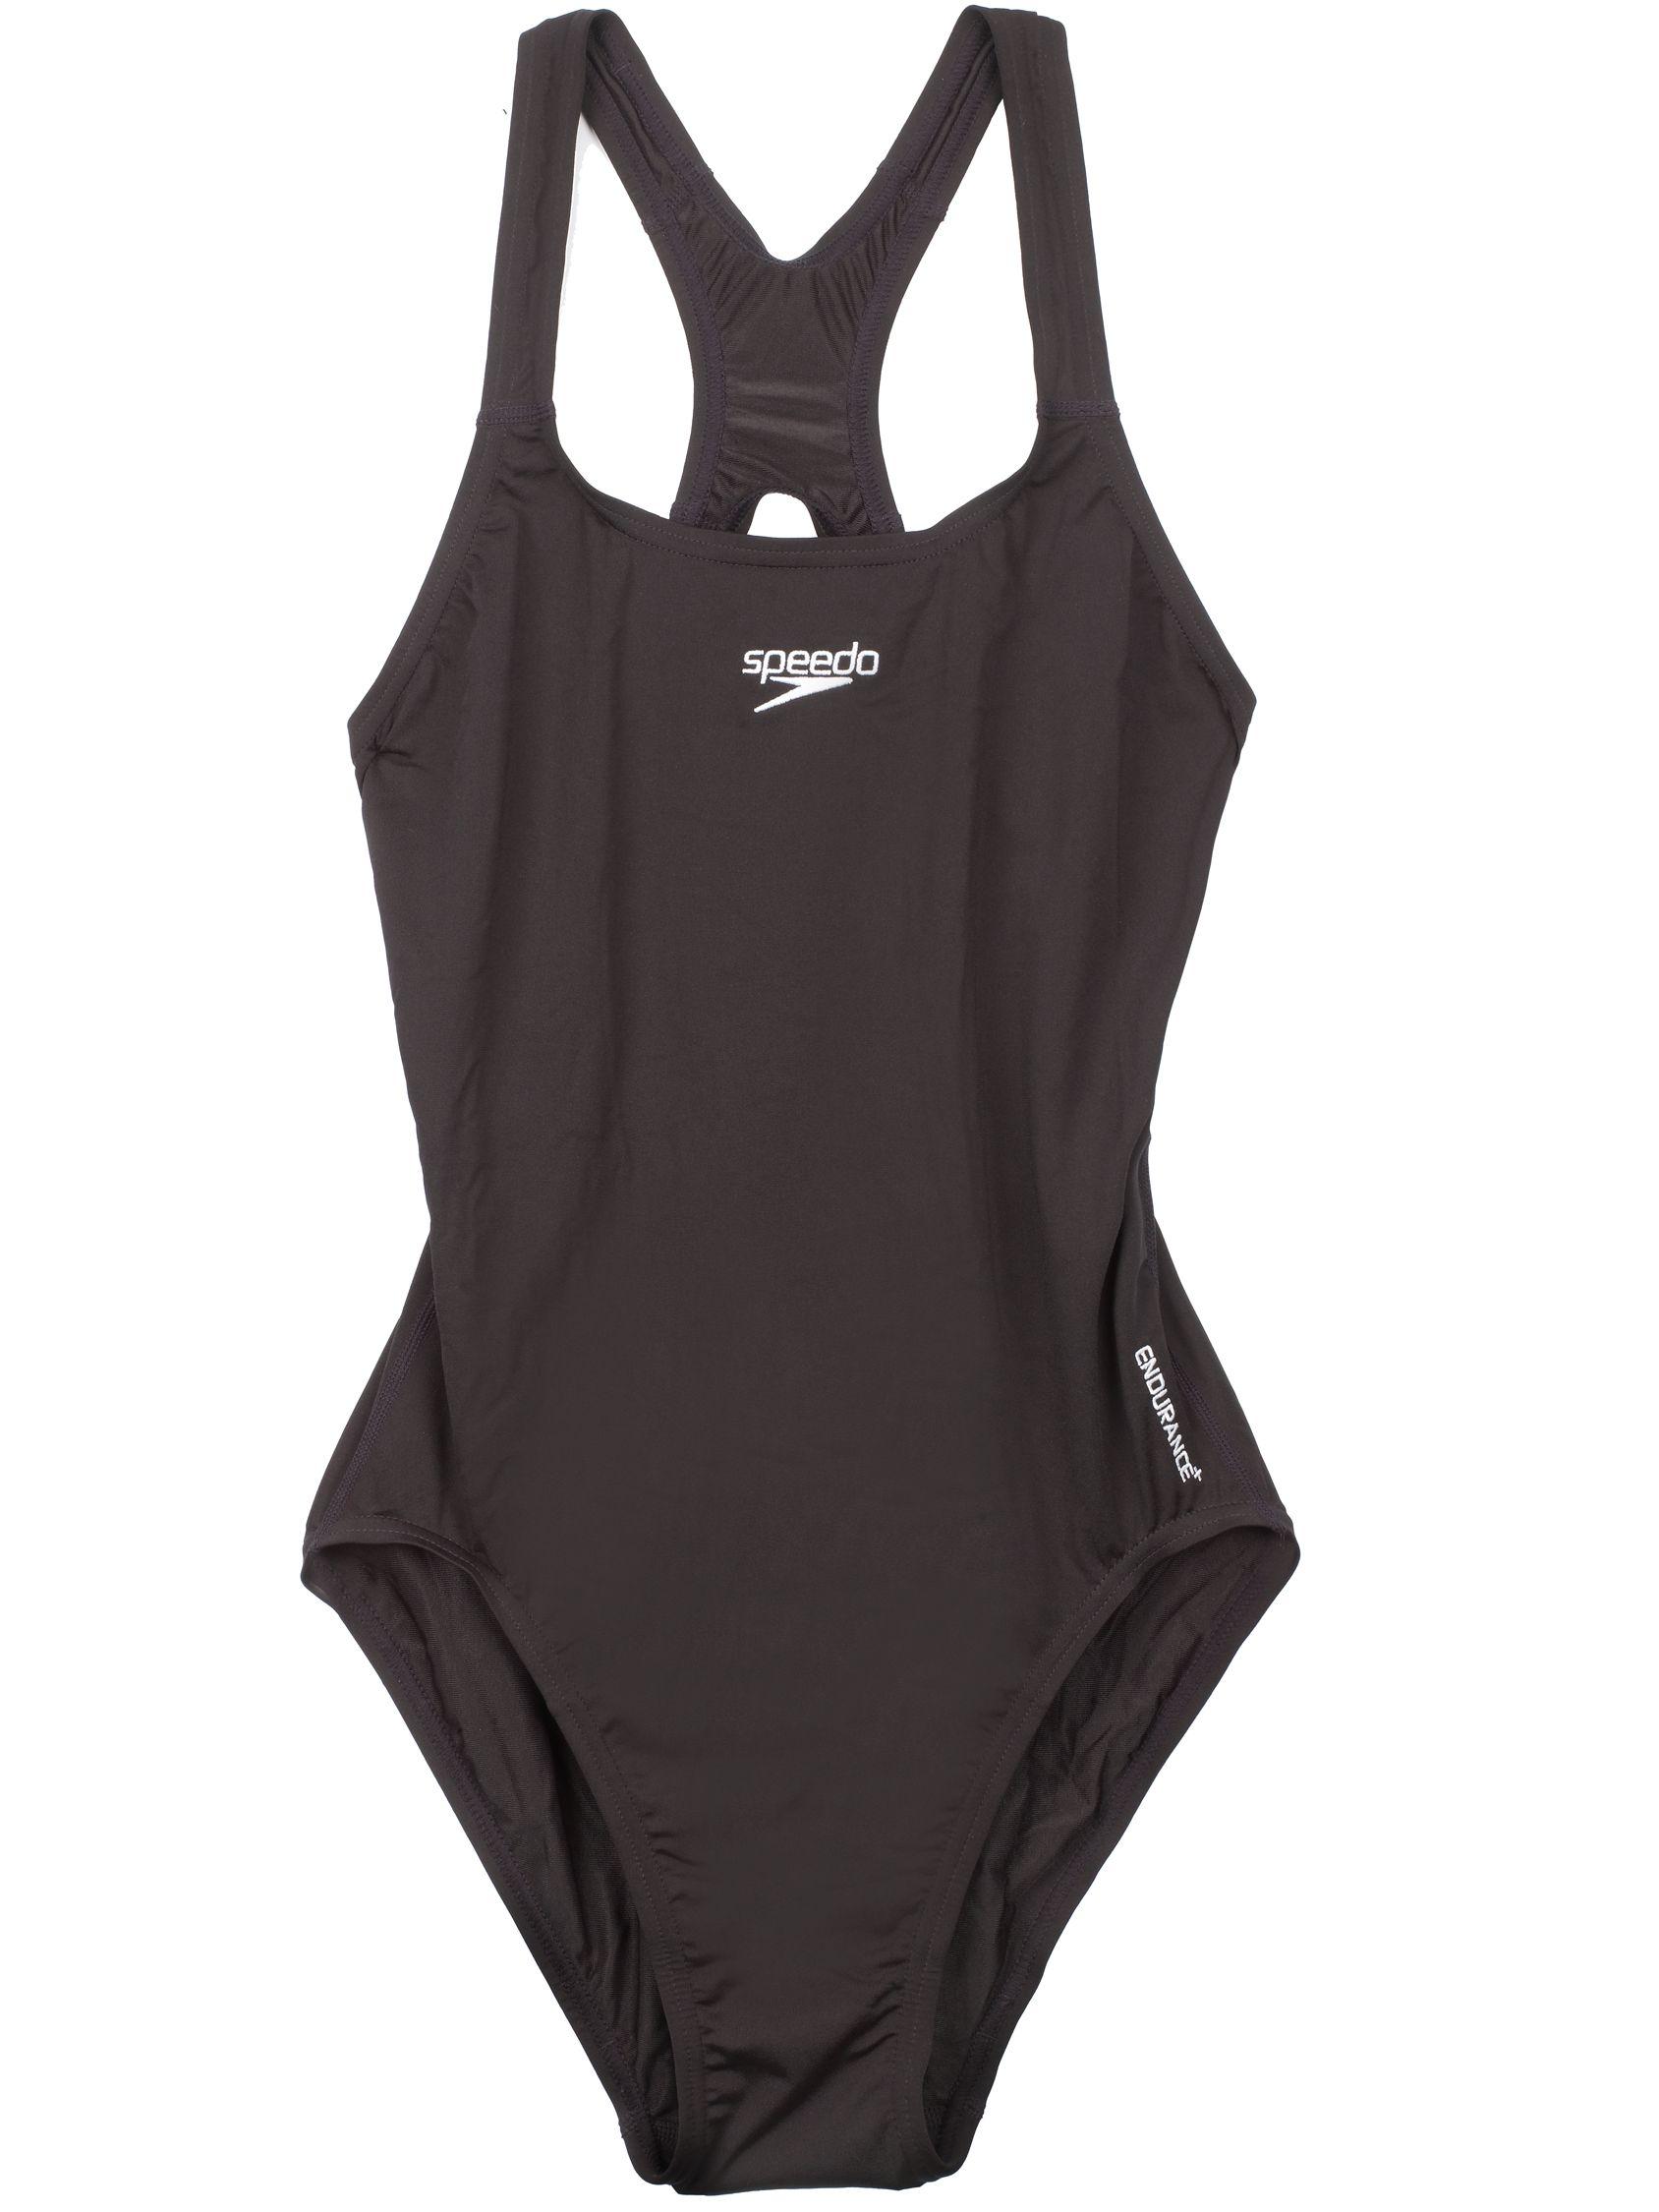 Speedo Speedo Girls' Medalist Swimsuit, Black